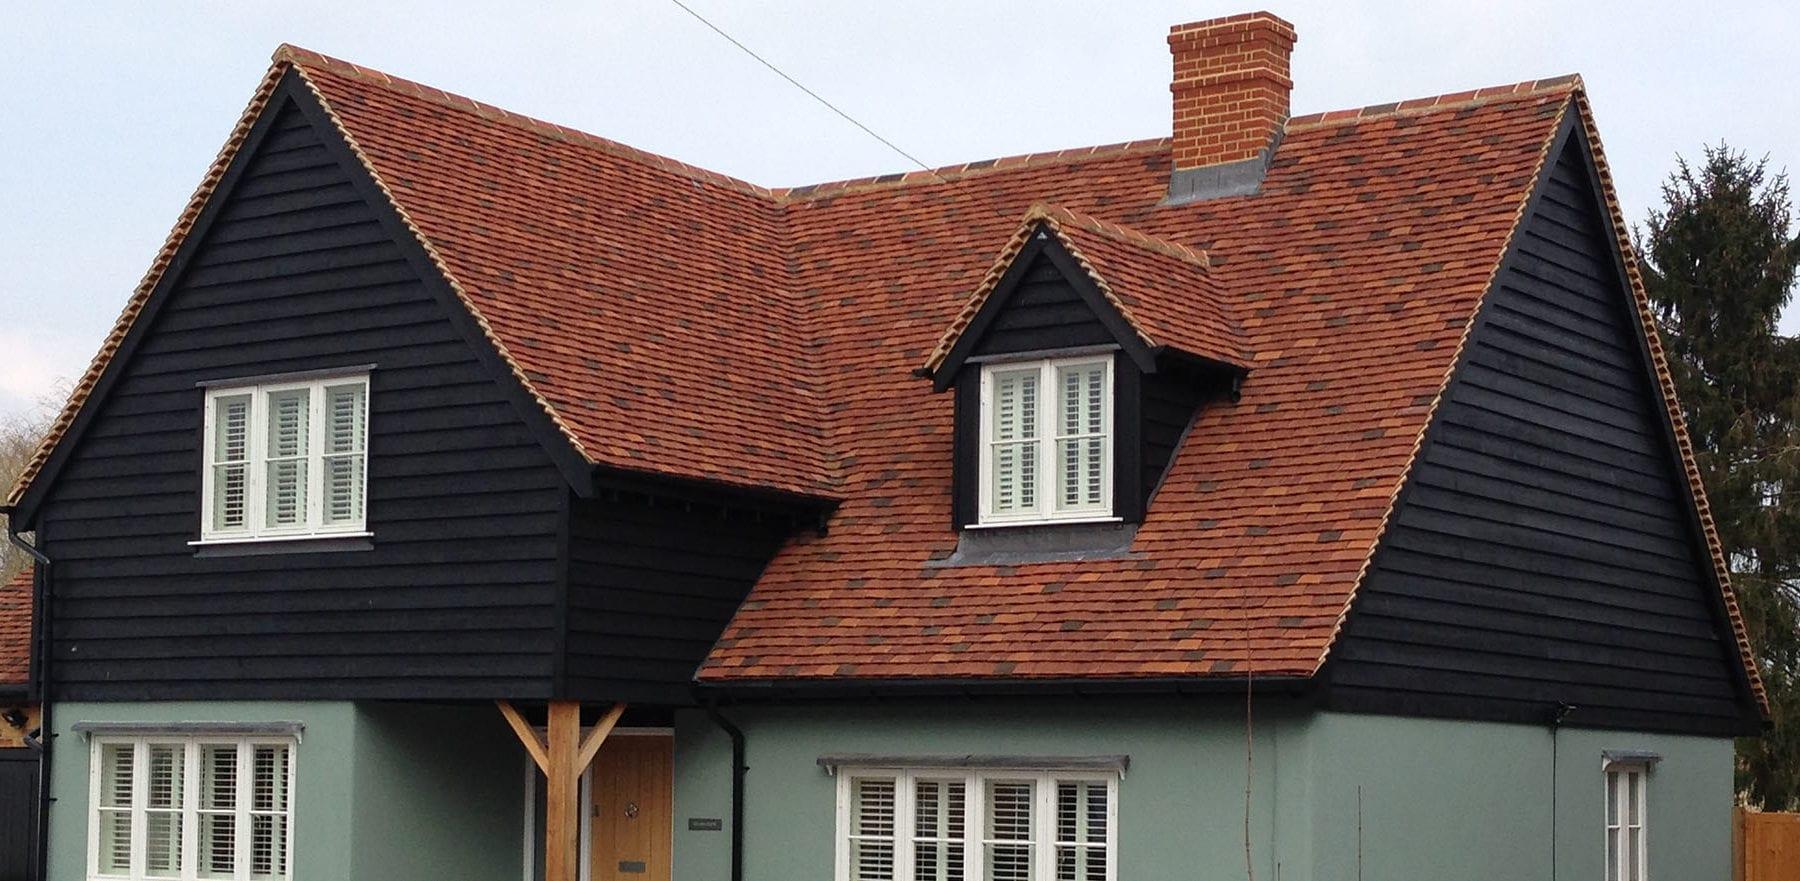 Lifestiles - Handmade Multi Clay Roof Tiles - Great Bardfield, England 4